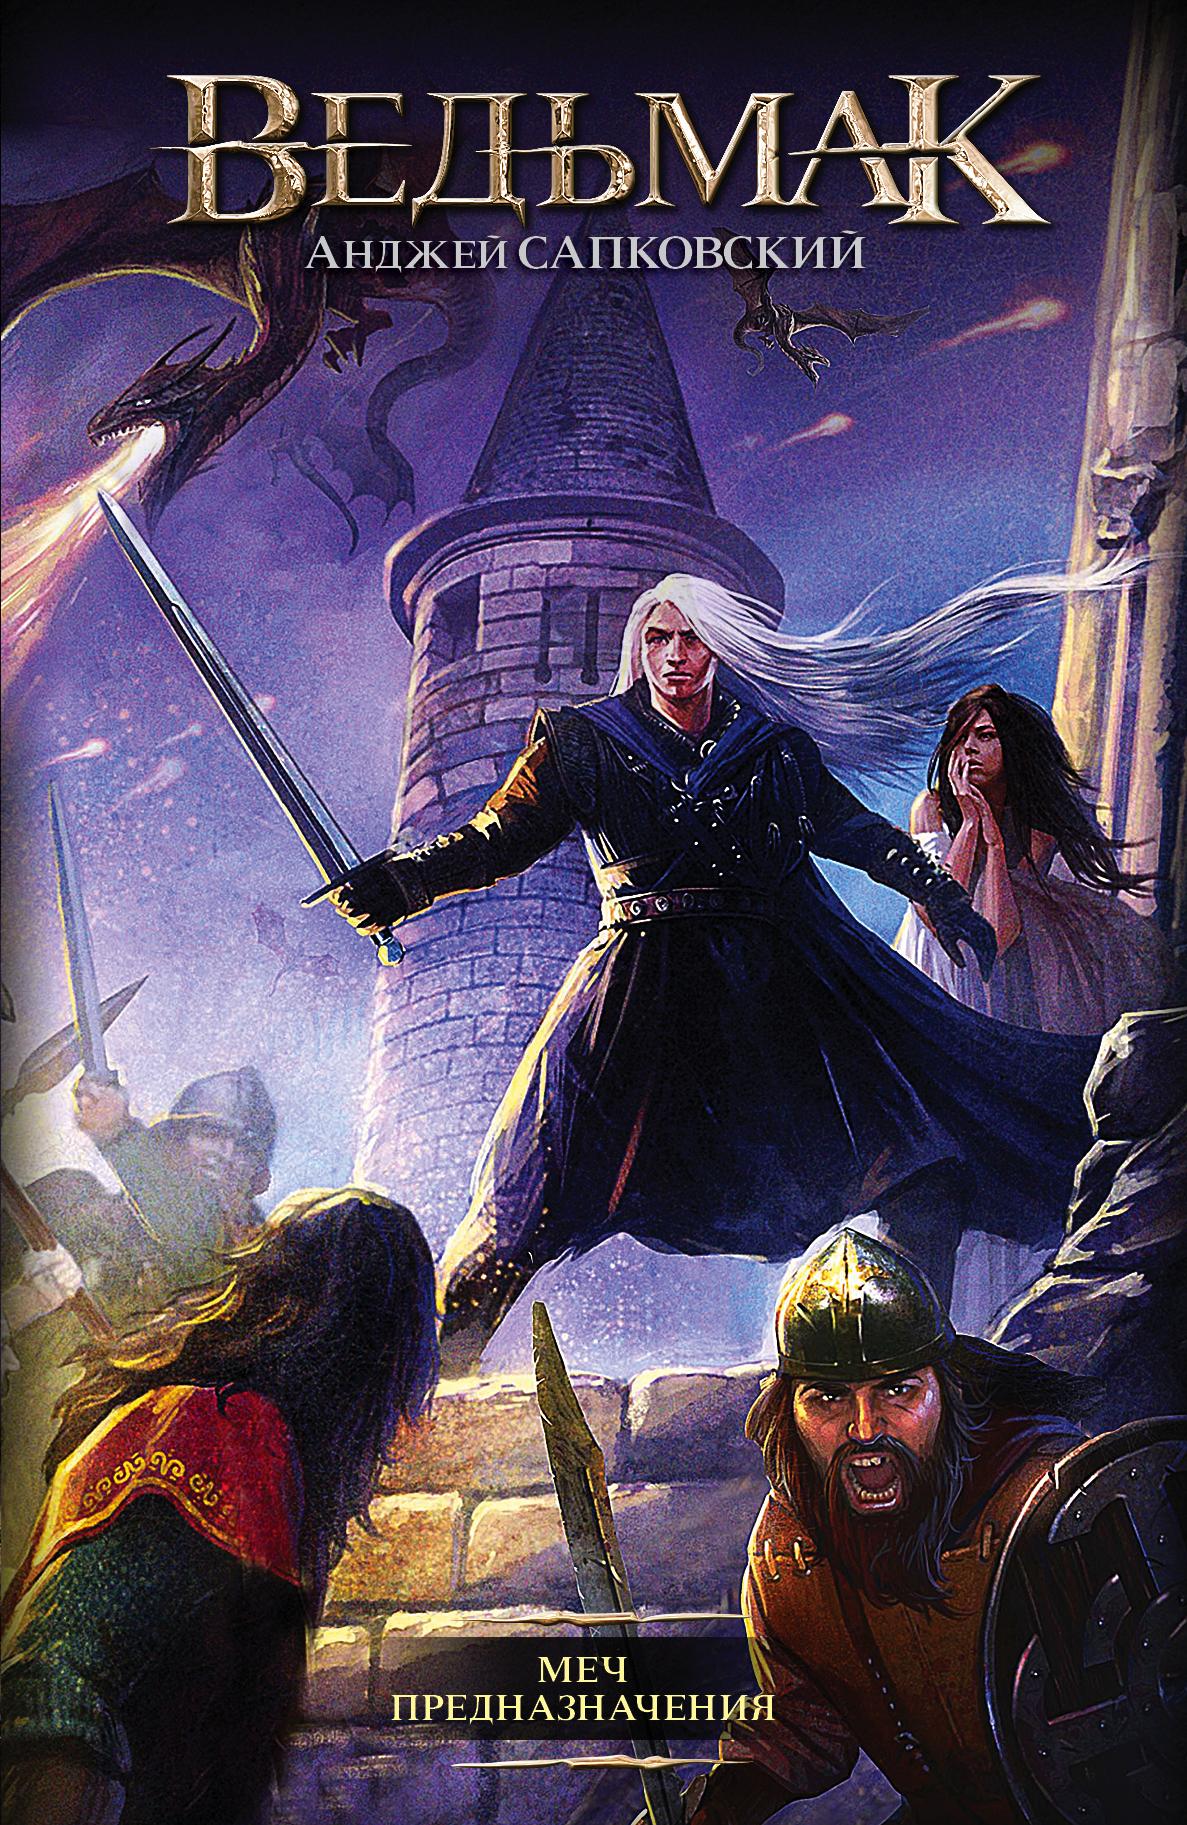 Скачать меч предназначения книга